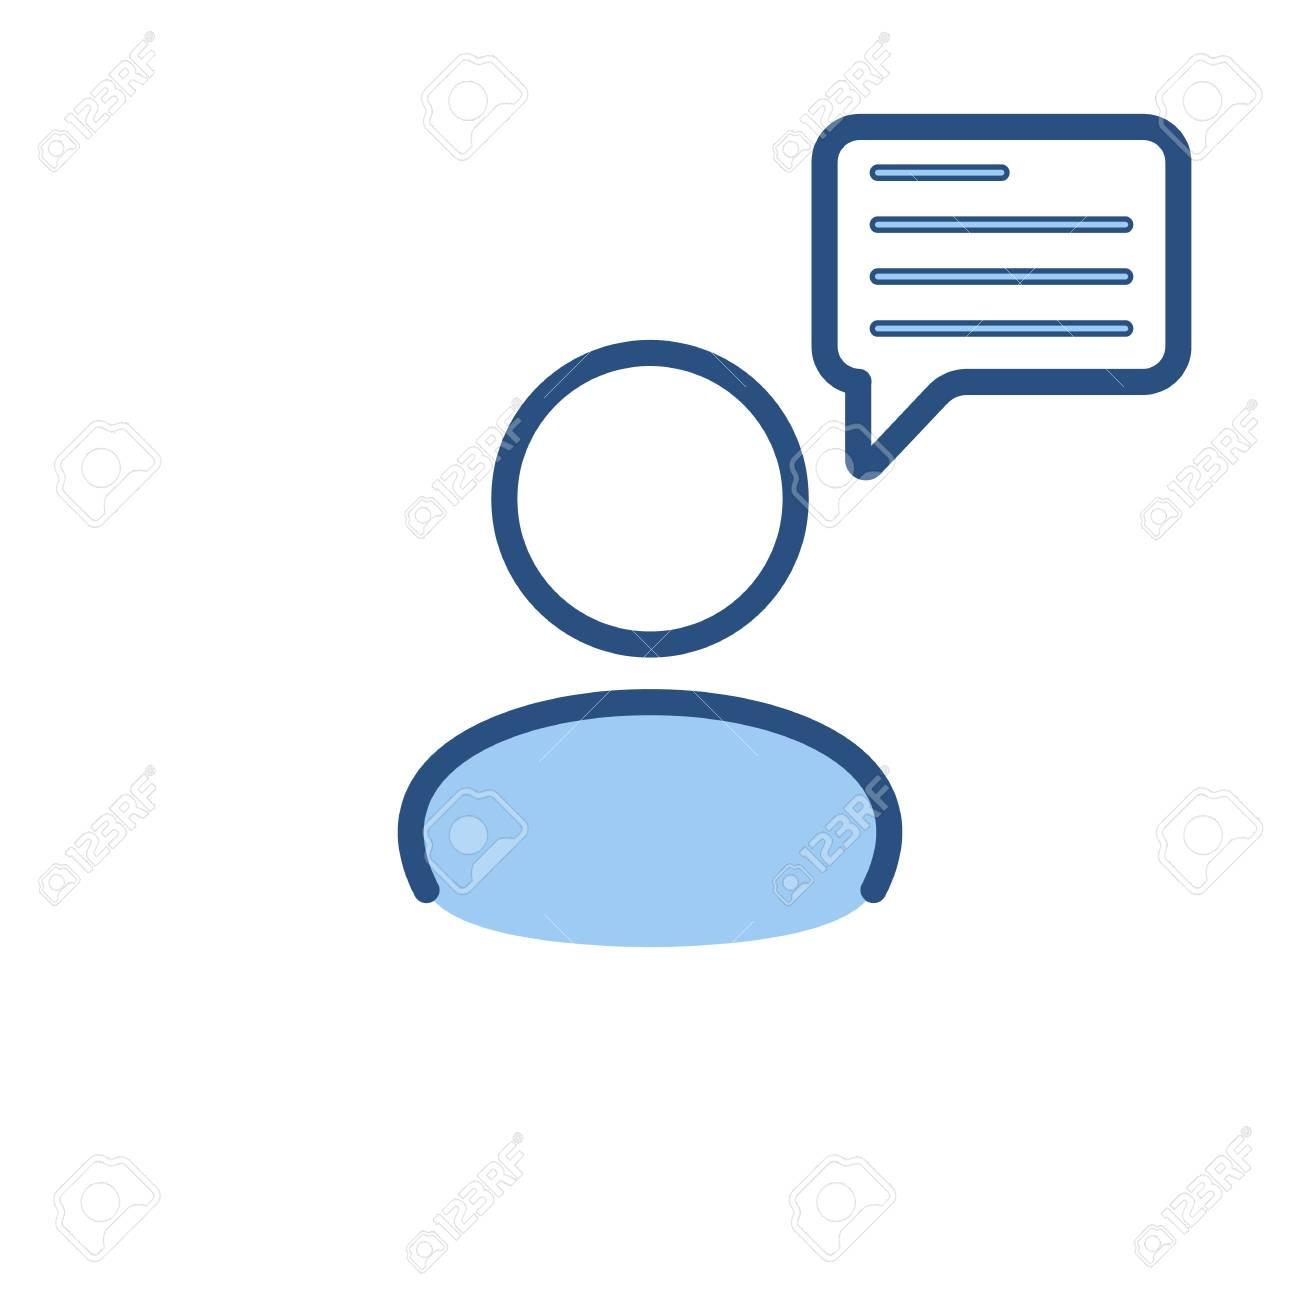 speech bubble user icon communication people talk icon vector rh 123rf com free vector speech bubble icon free vector cartoon speech bubbles